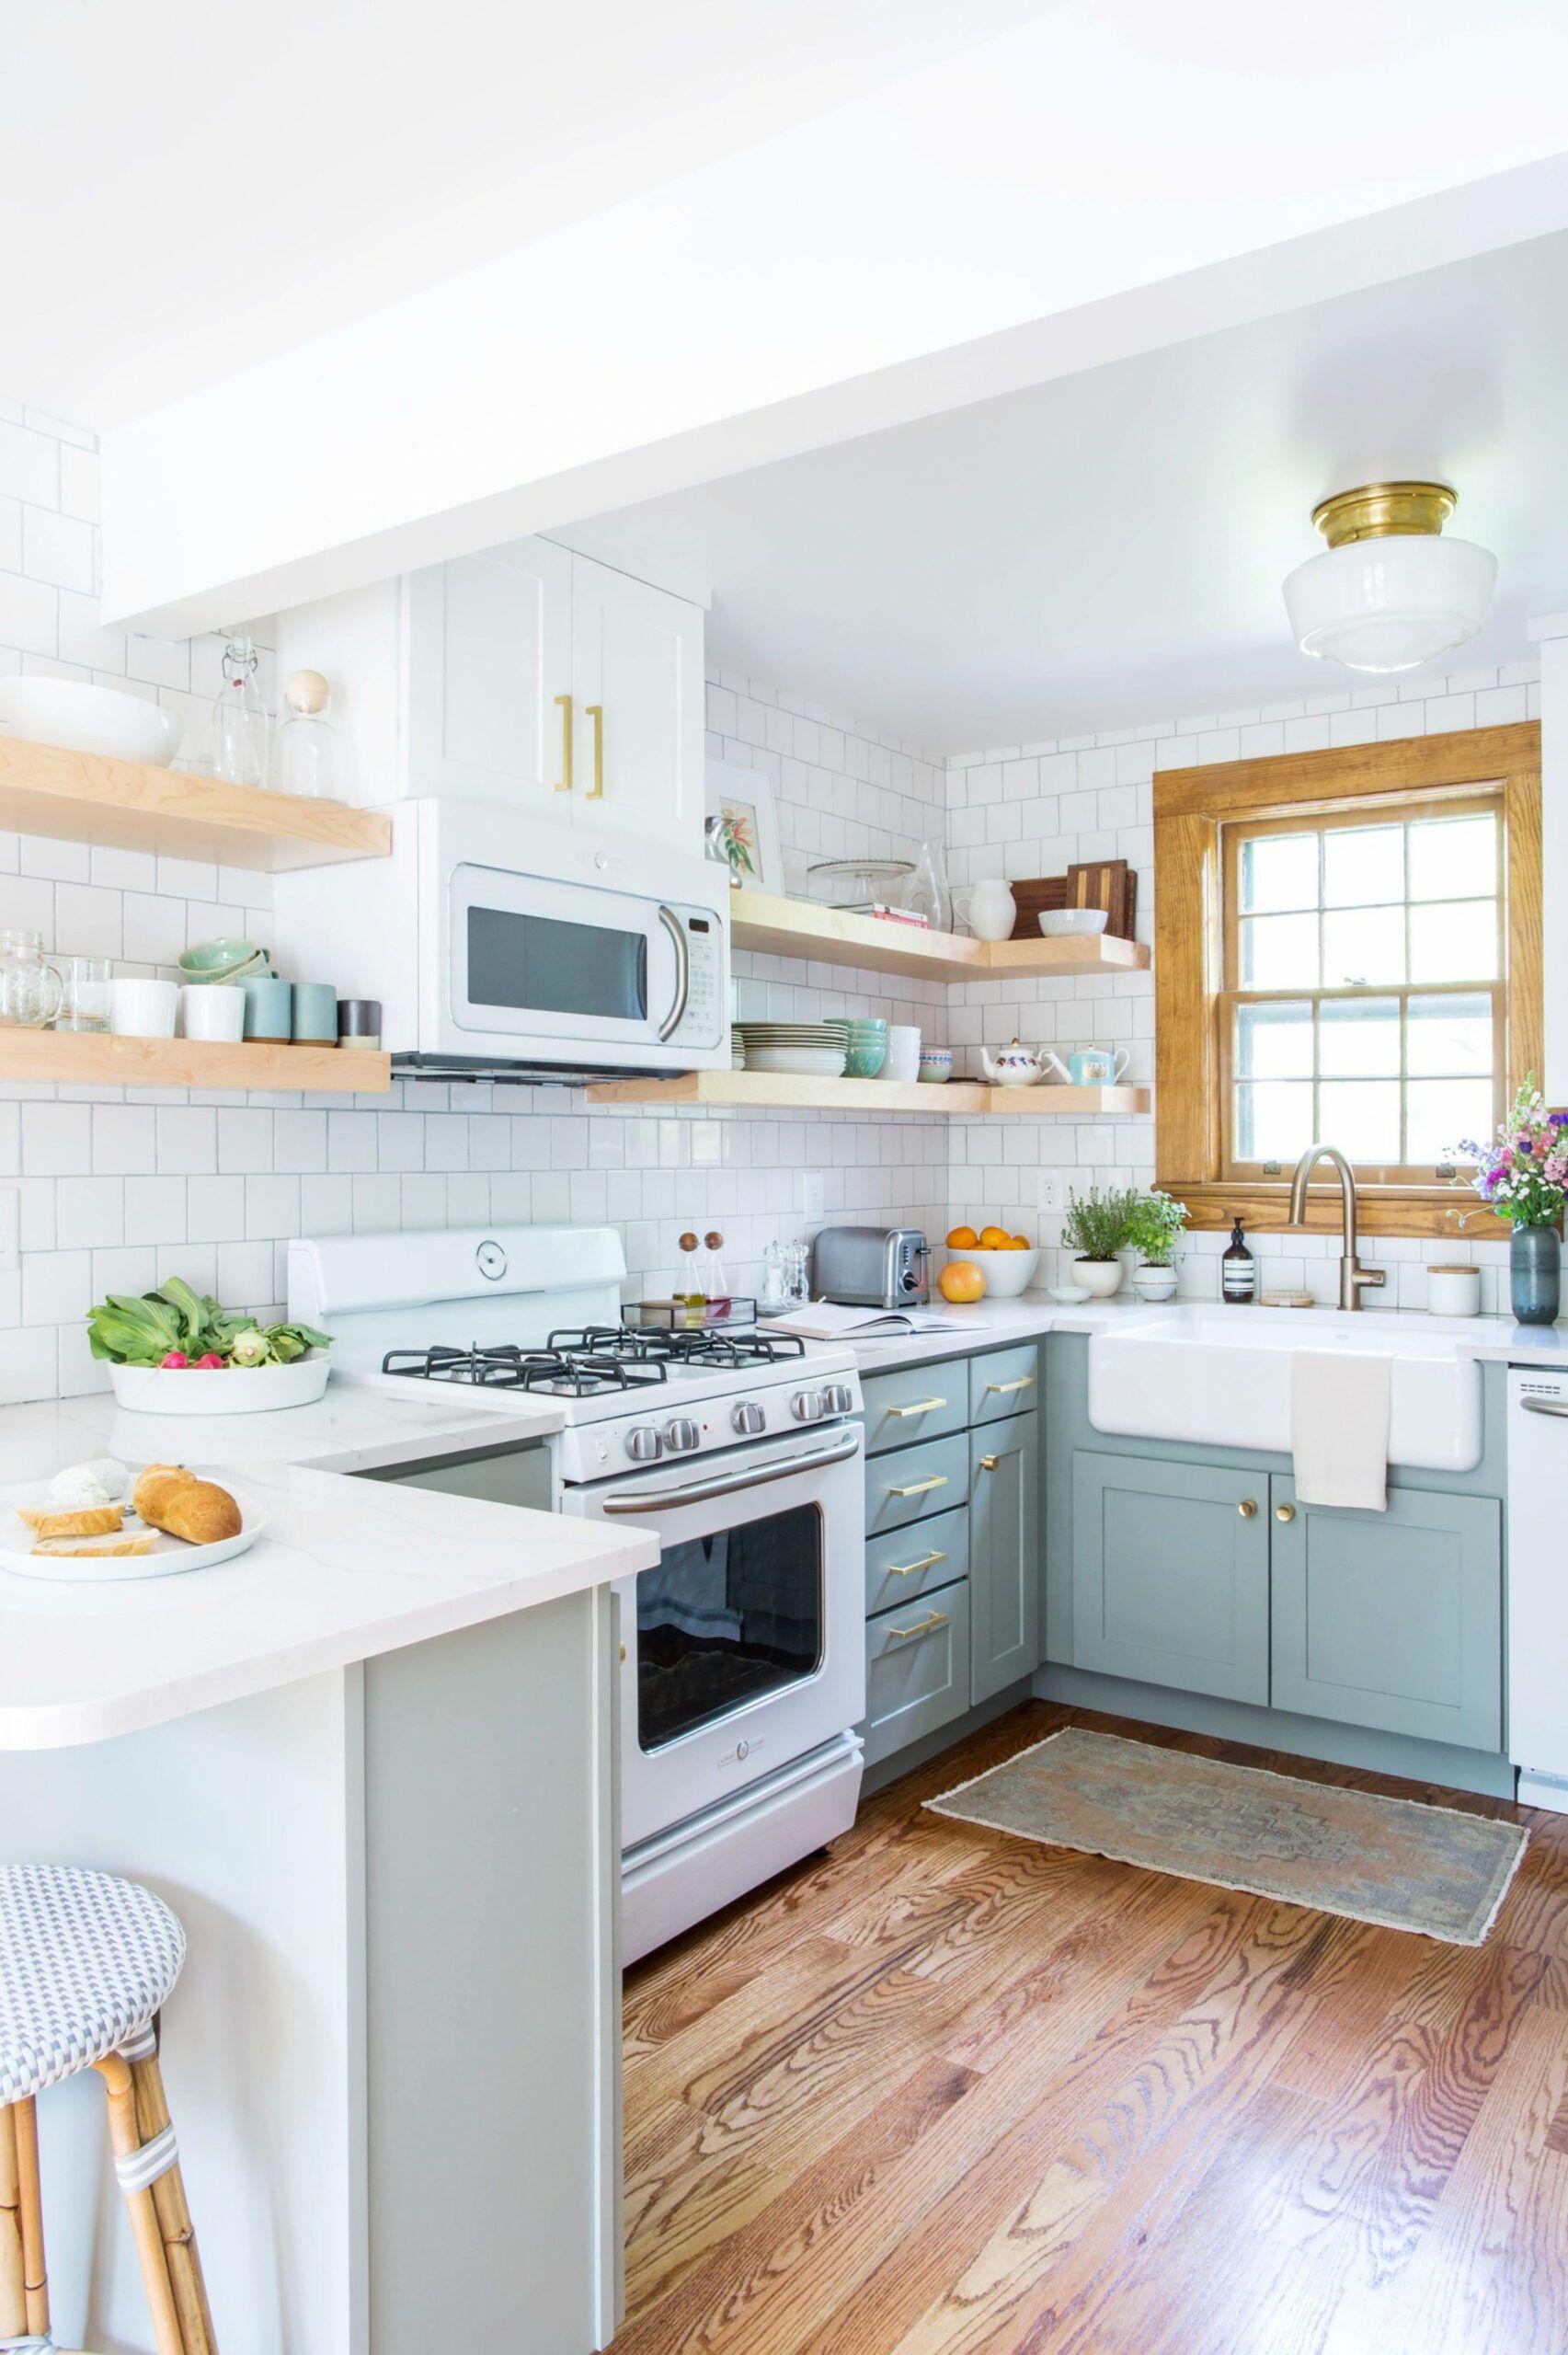 12 best upper cabinets for kitchen di 2020 desain dapur ide penyimpanan dapur on farmhouse kitchen no upper cabinets id=75308